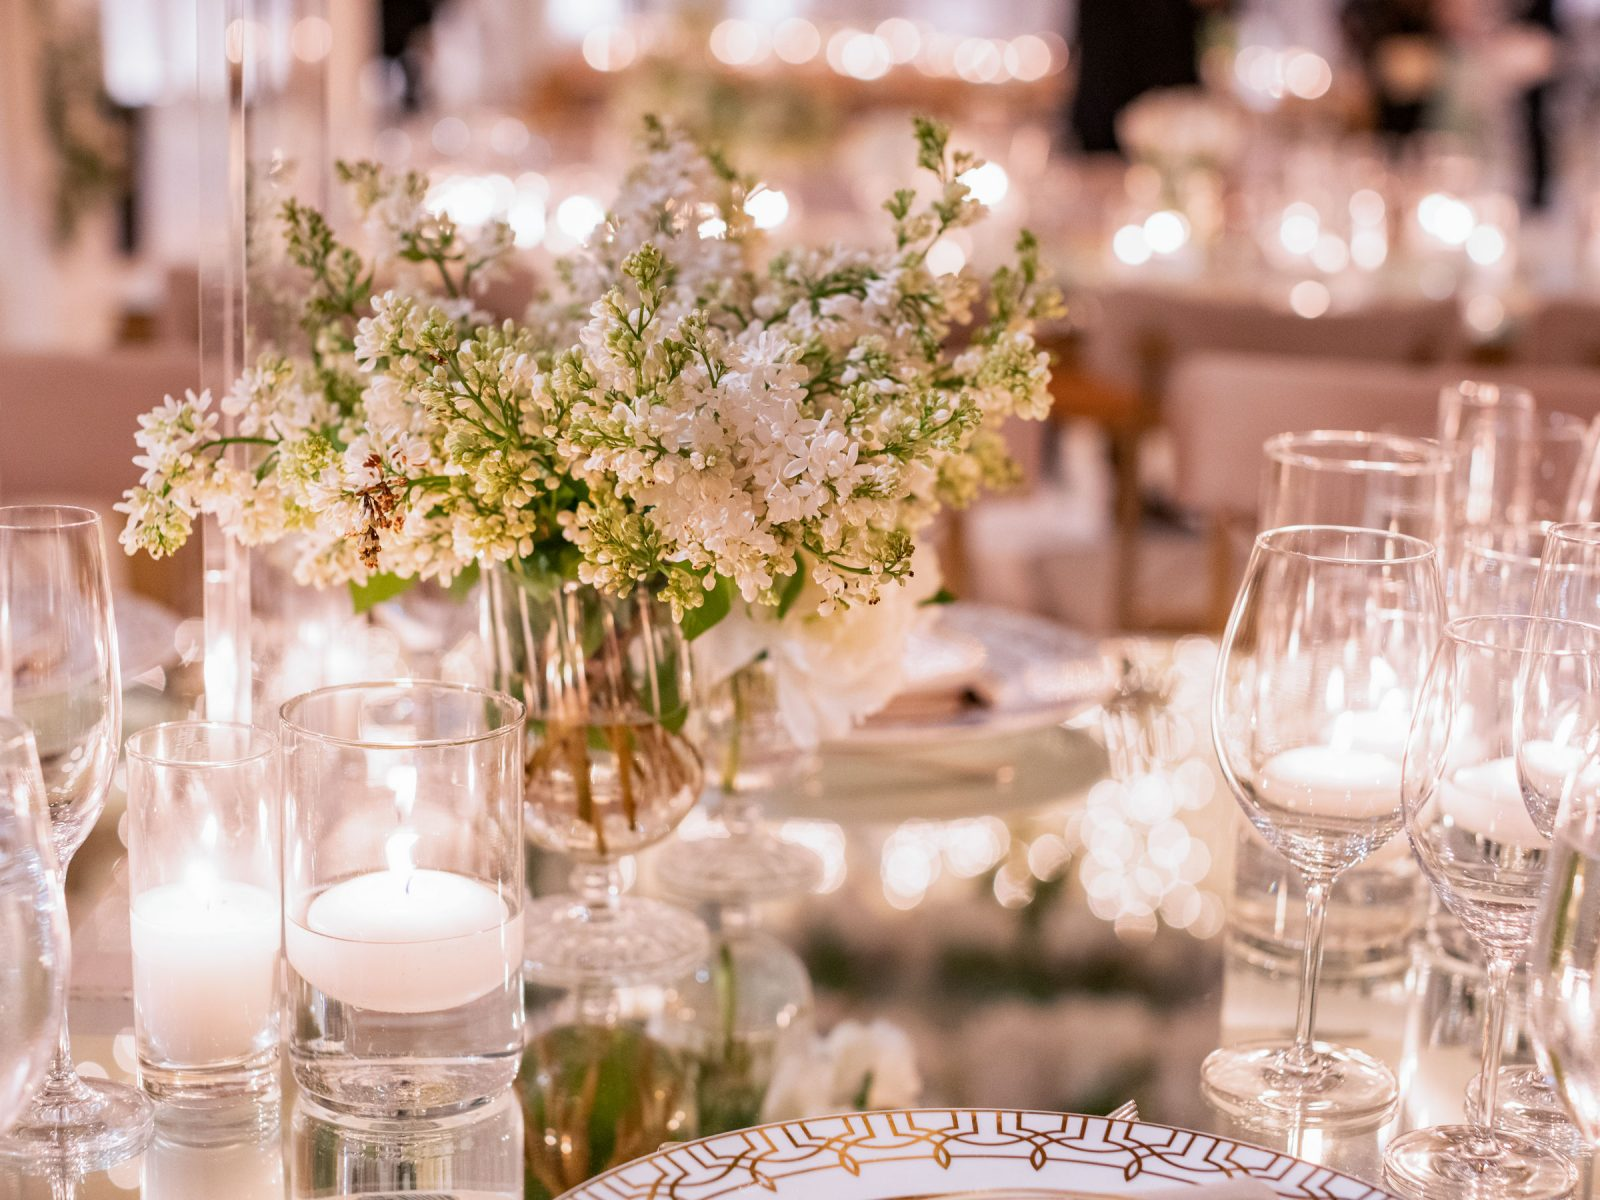 maria-eduardo-montage-beverly-hills-wedding-194.jpg